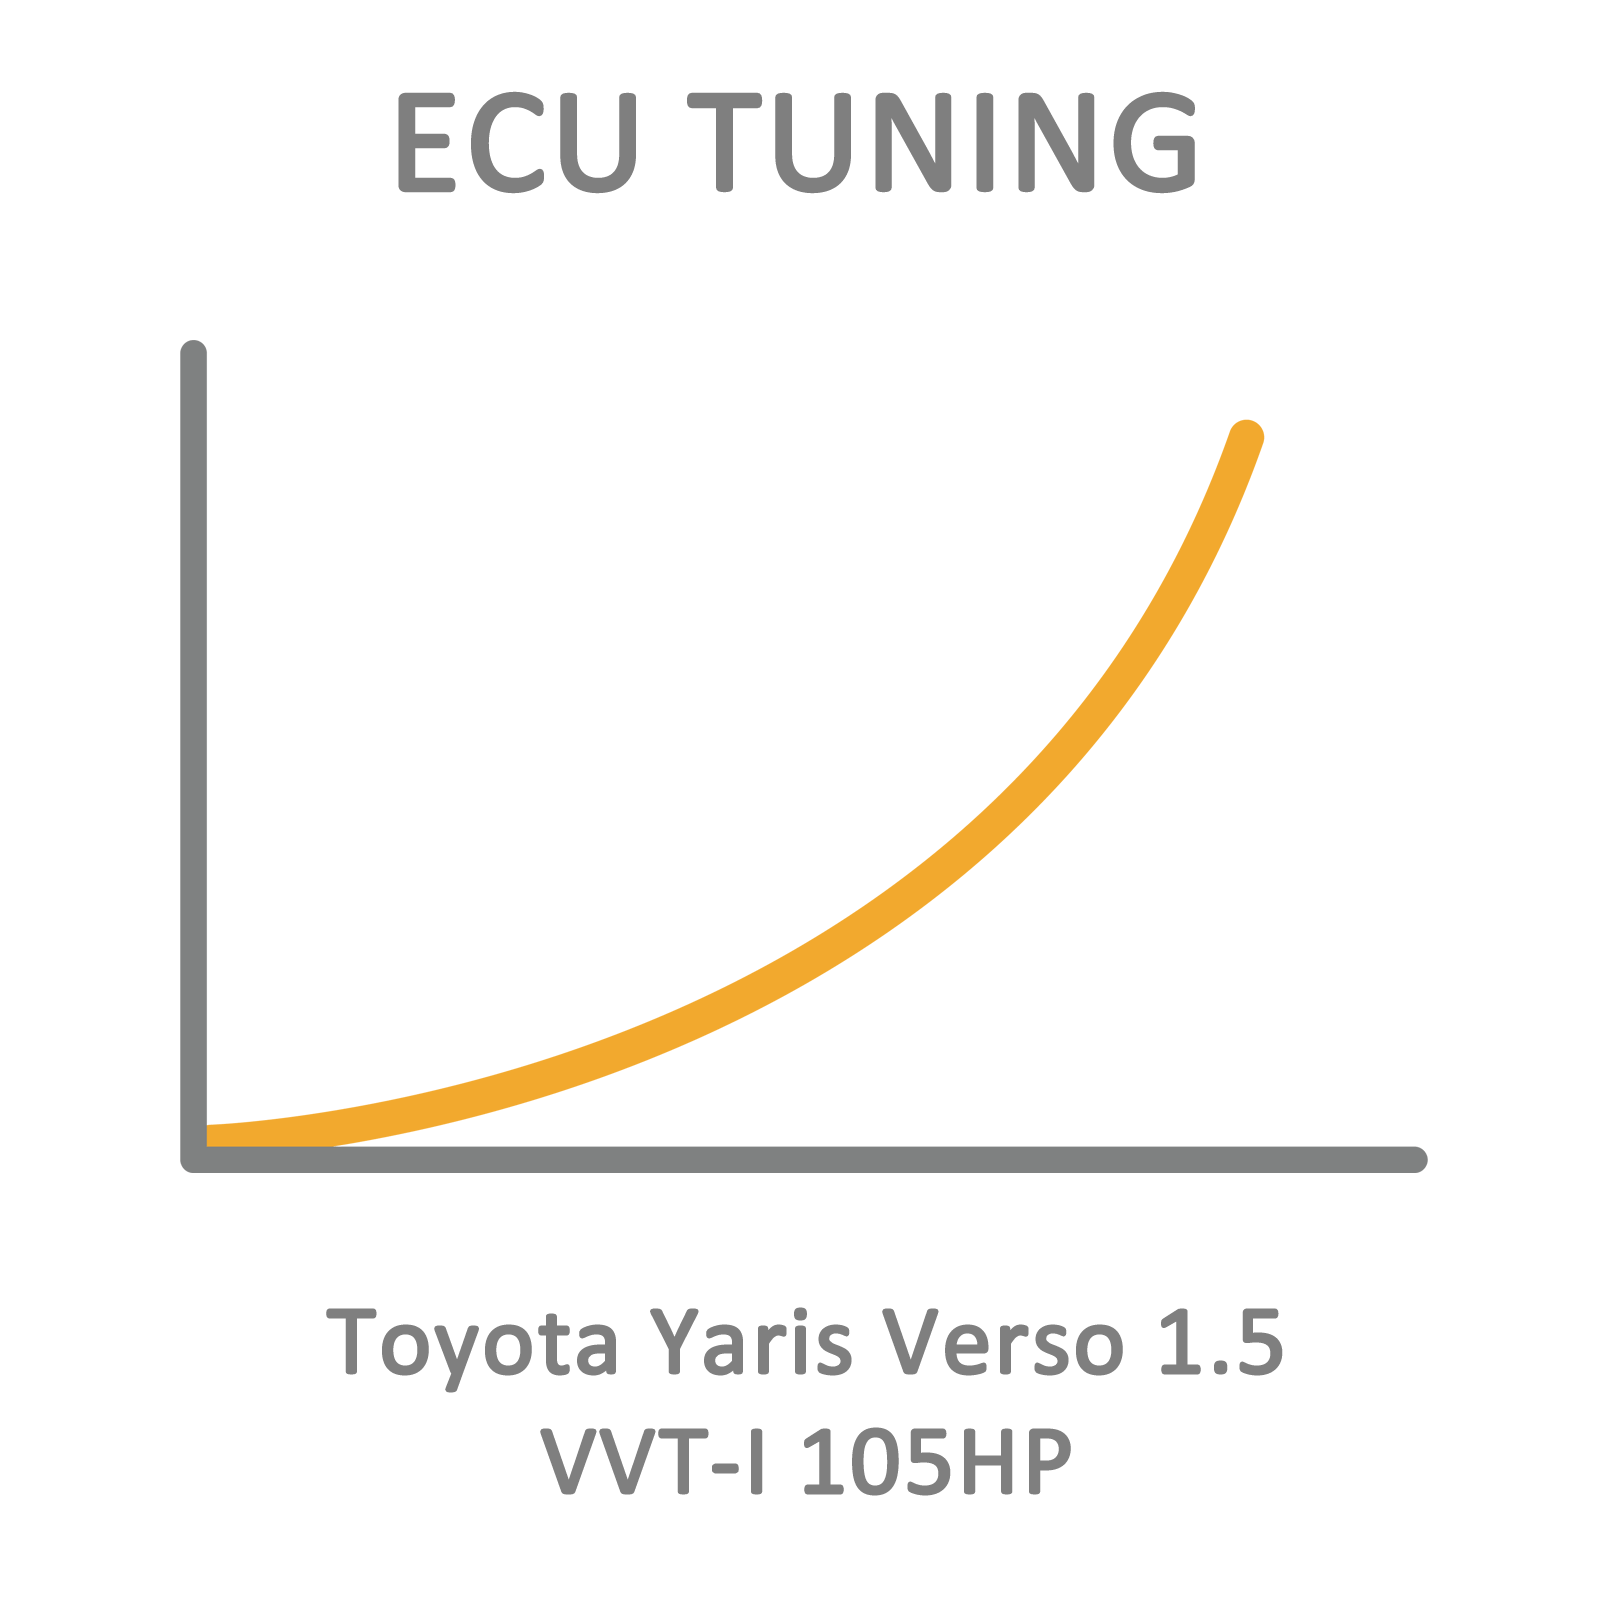 Toyota Yaris Verso 1.5 VVT-I 105HP ECU Tuning Remapping